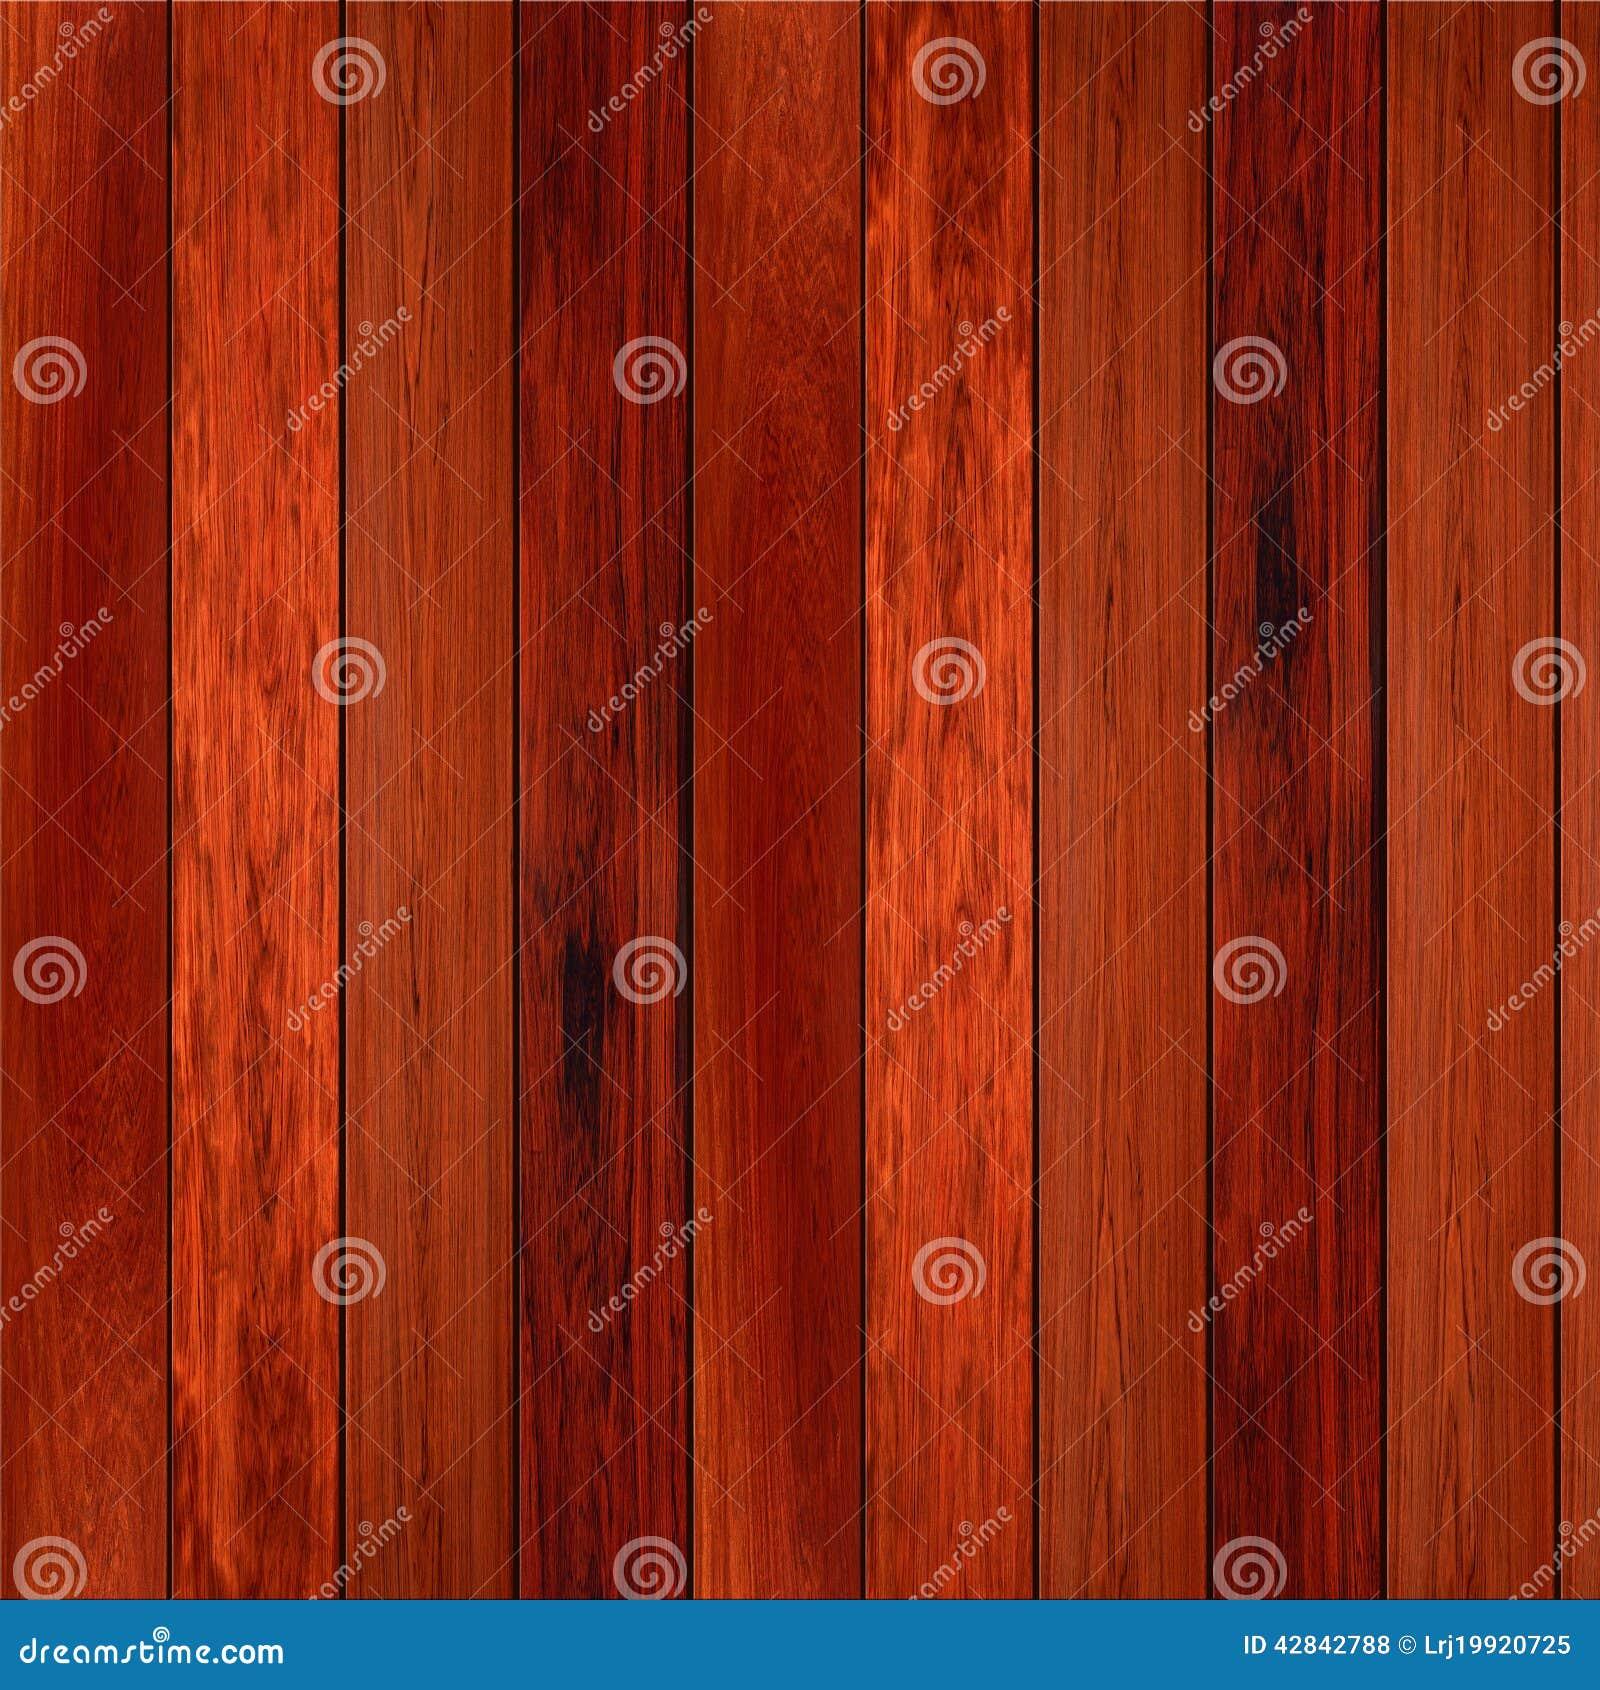 Birch Wood Grain ~ Birch wood grain details royalty free stock photo